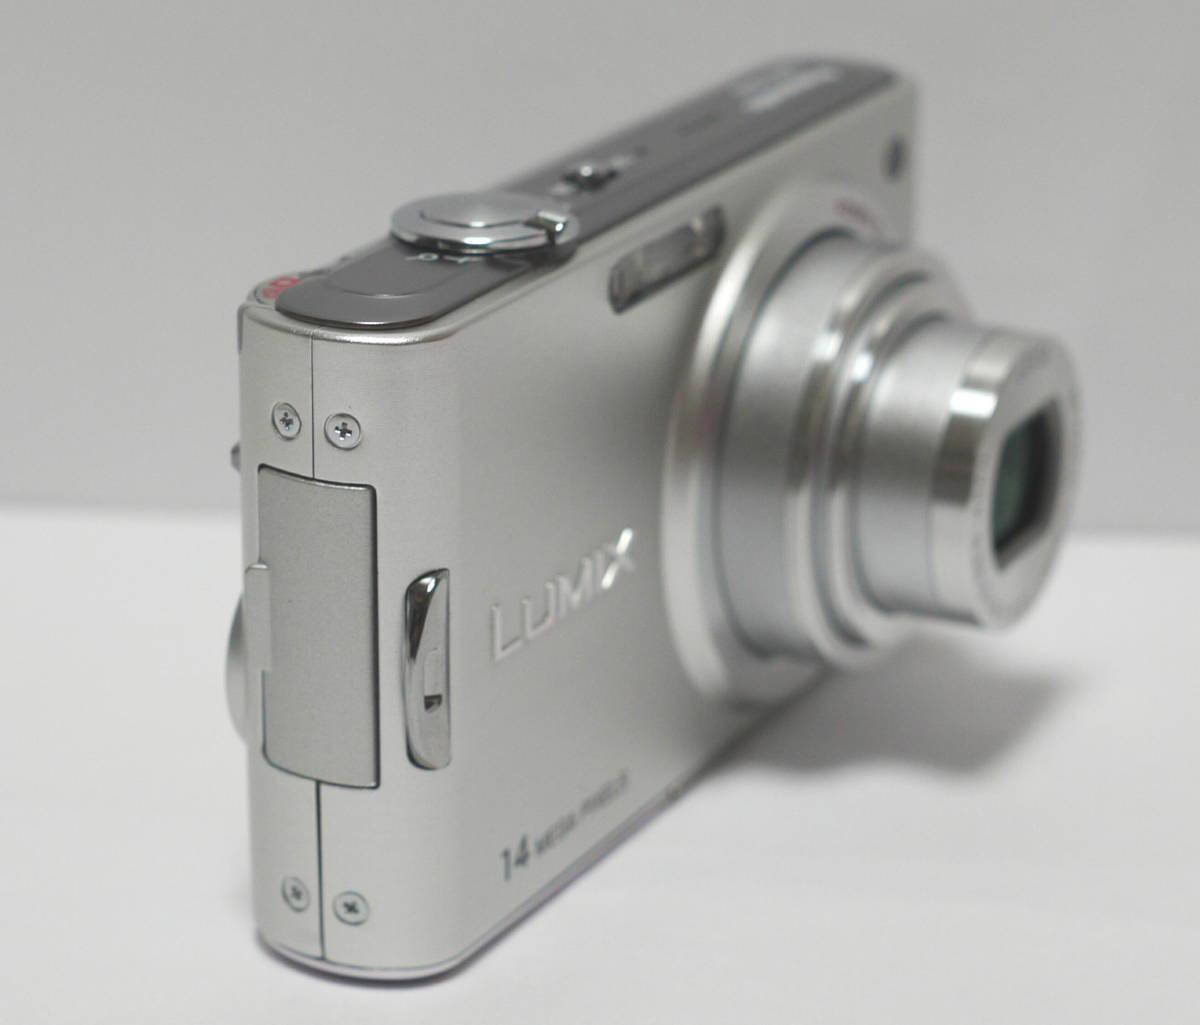 PANASONIC パナソニック デジタルカメラ 1410万画素 LUMIX  DMC-FX66 動作・美品 バッテリー DMW-BCF10付_画像4